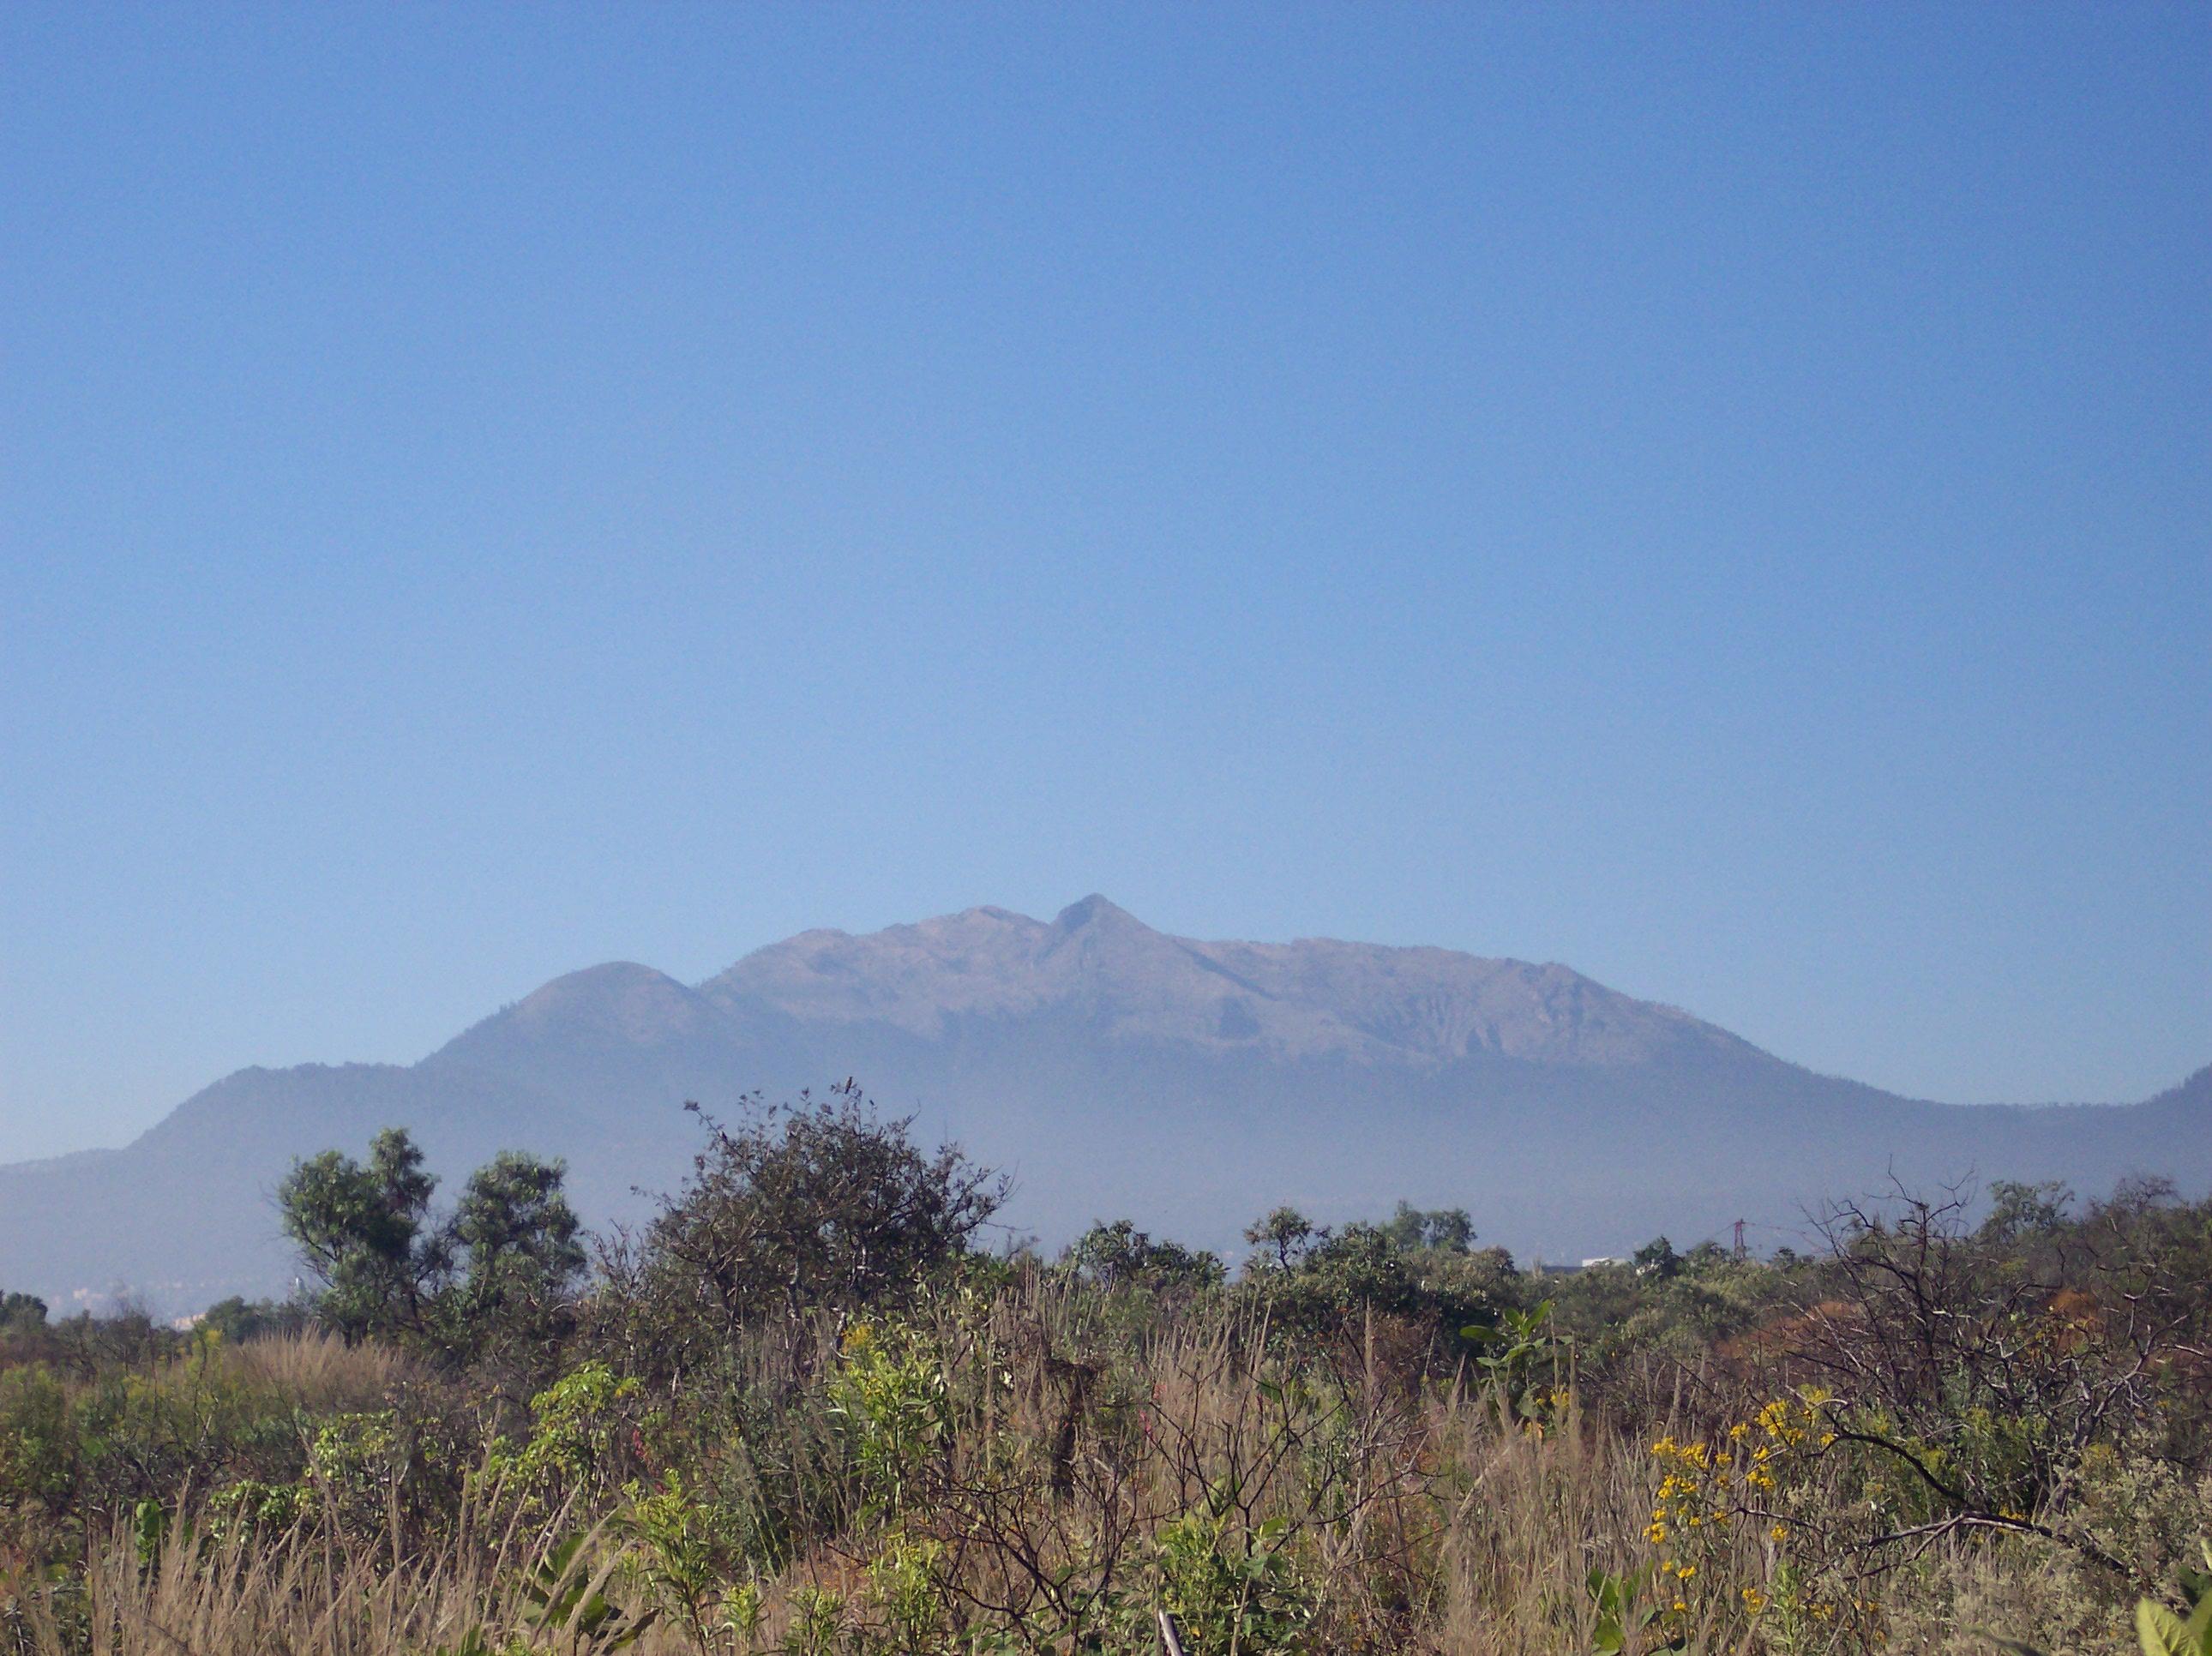 Depiction of Sierra de Ajusco-Chichinauhtzin